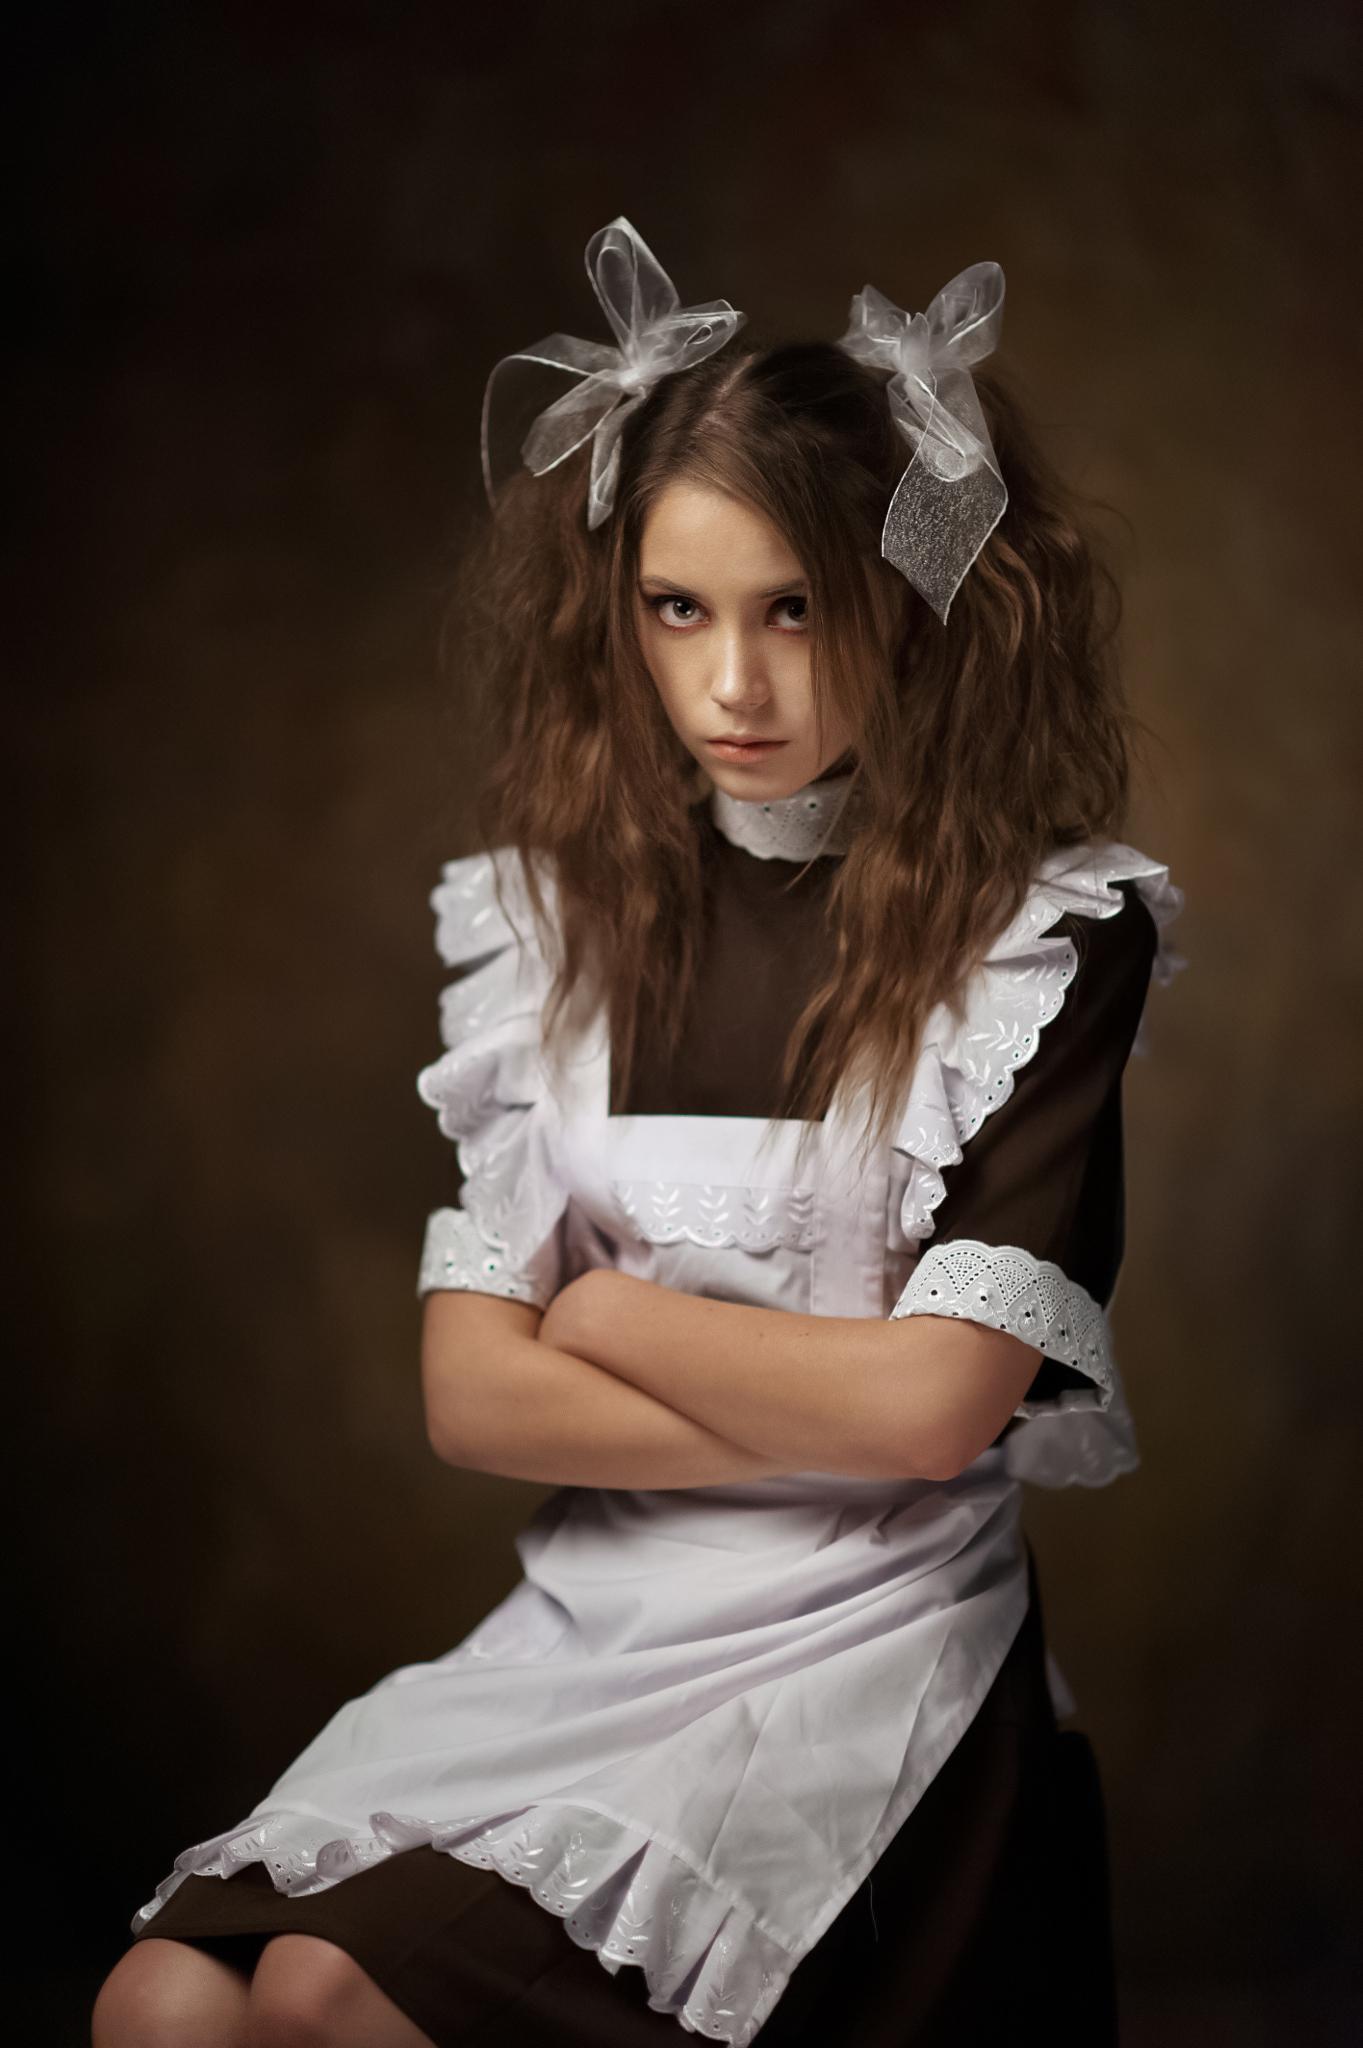 Maxim Maximov Women Ksenia Kokoreva Brunette Looking At Viewer Long Hair Simple Background Apron Han 1363x2048